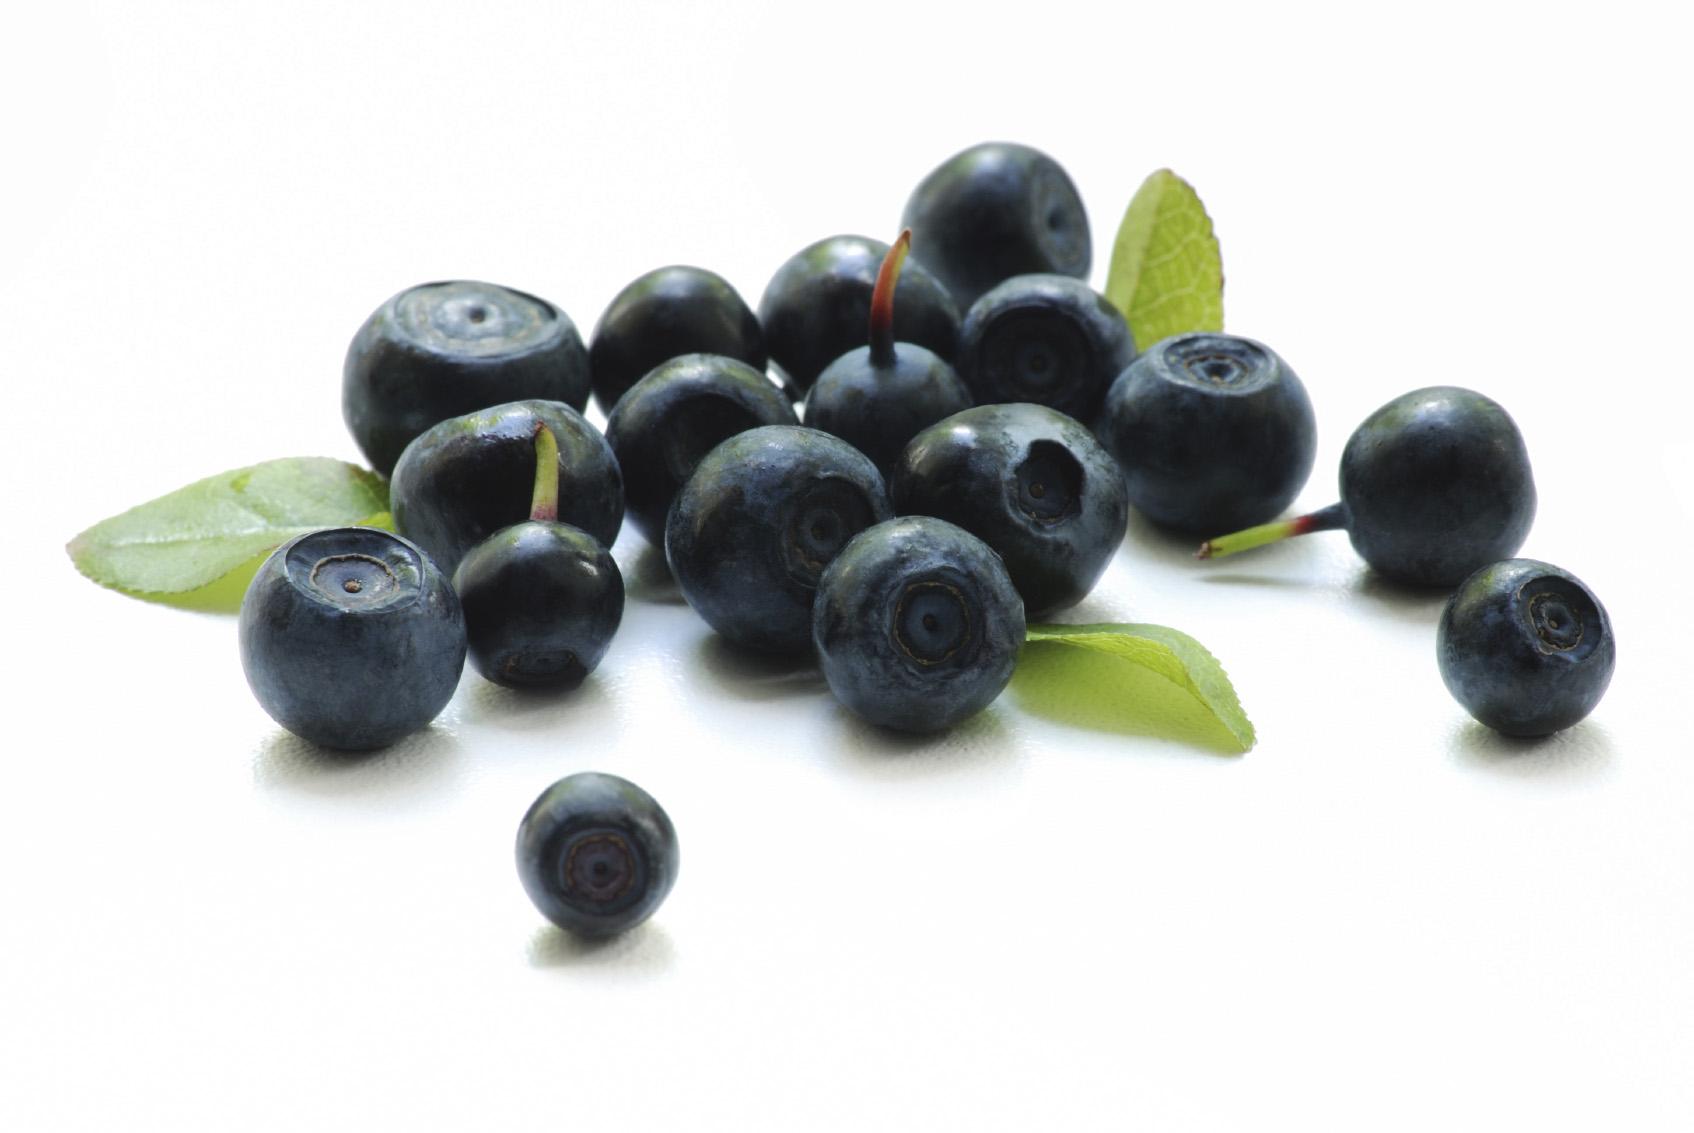 Acai Berries flavor